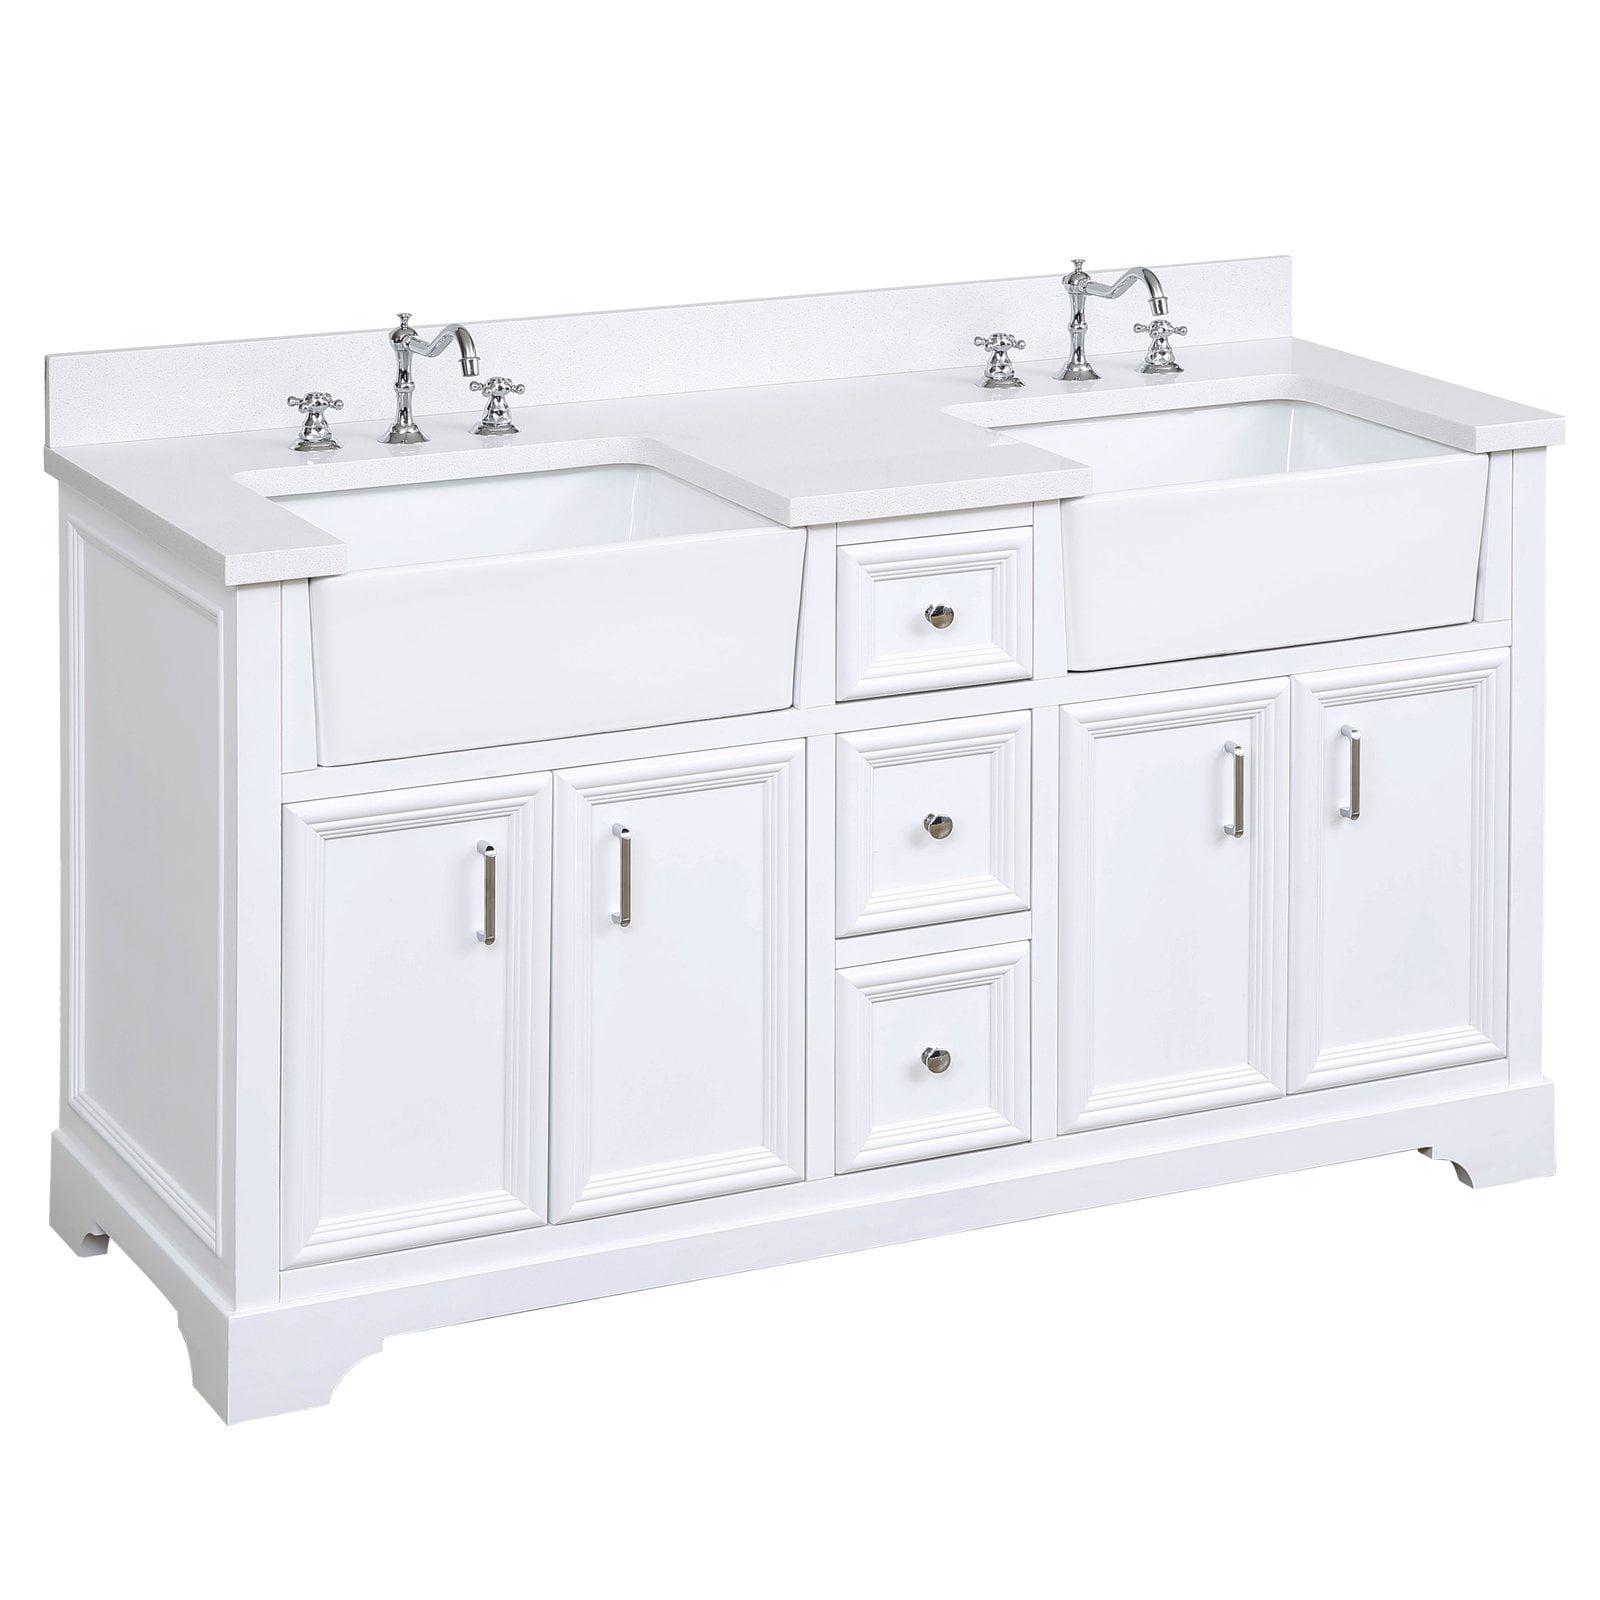 Picture of: Includes A Quartz Countertop And White Ceramic Farmhouse Apron Sink Quartz Powder Gray Powder Gray Cabinet With Soft Close Doors Drawers Zelda 60 Inch Single Bathroom Vanity Bathroom Vanities